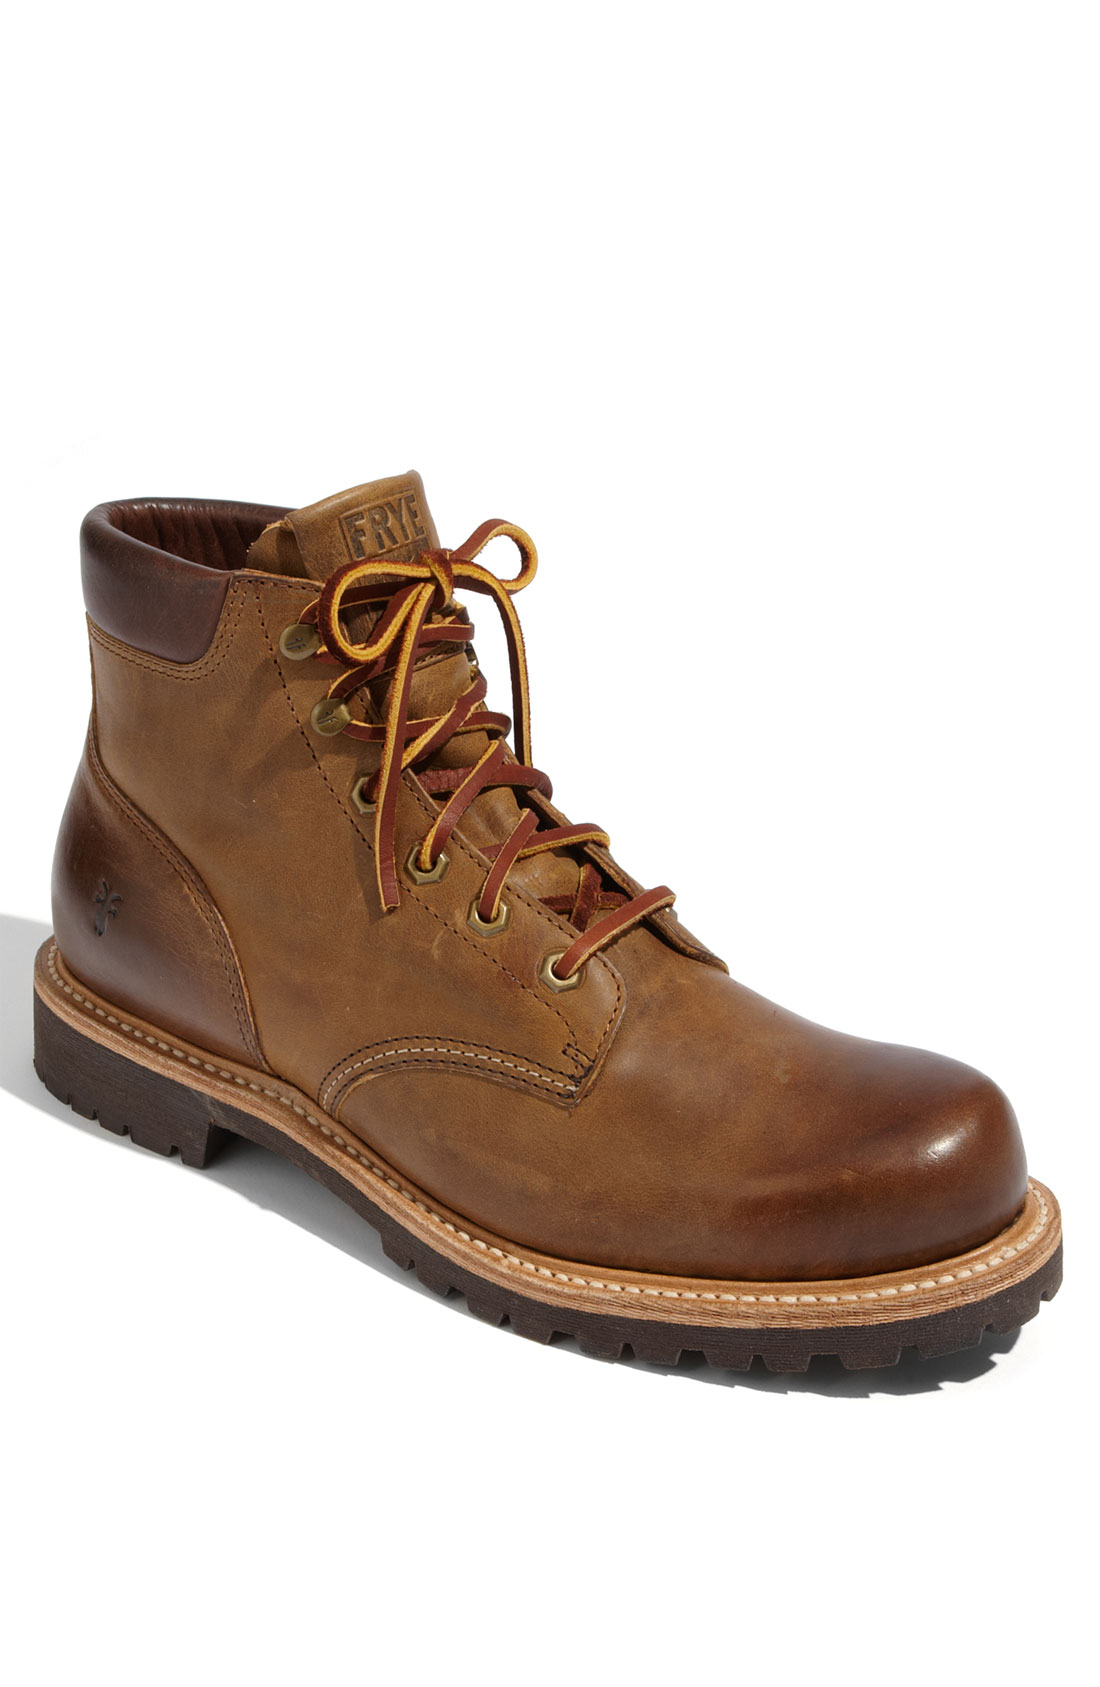 frye dakota plain toe boot in brown for lyst